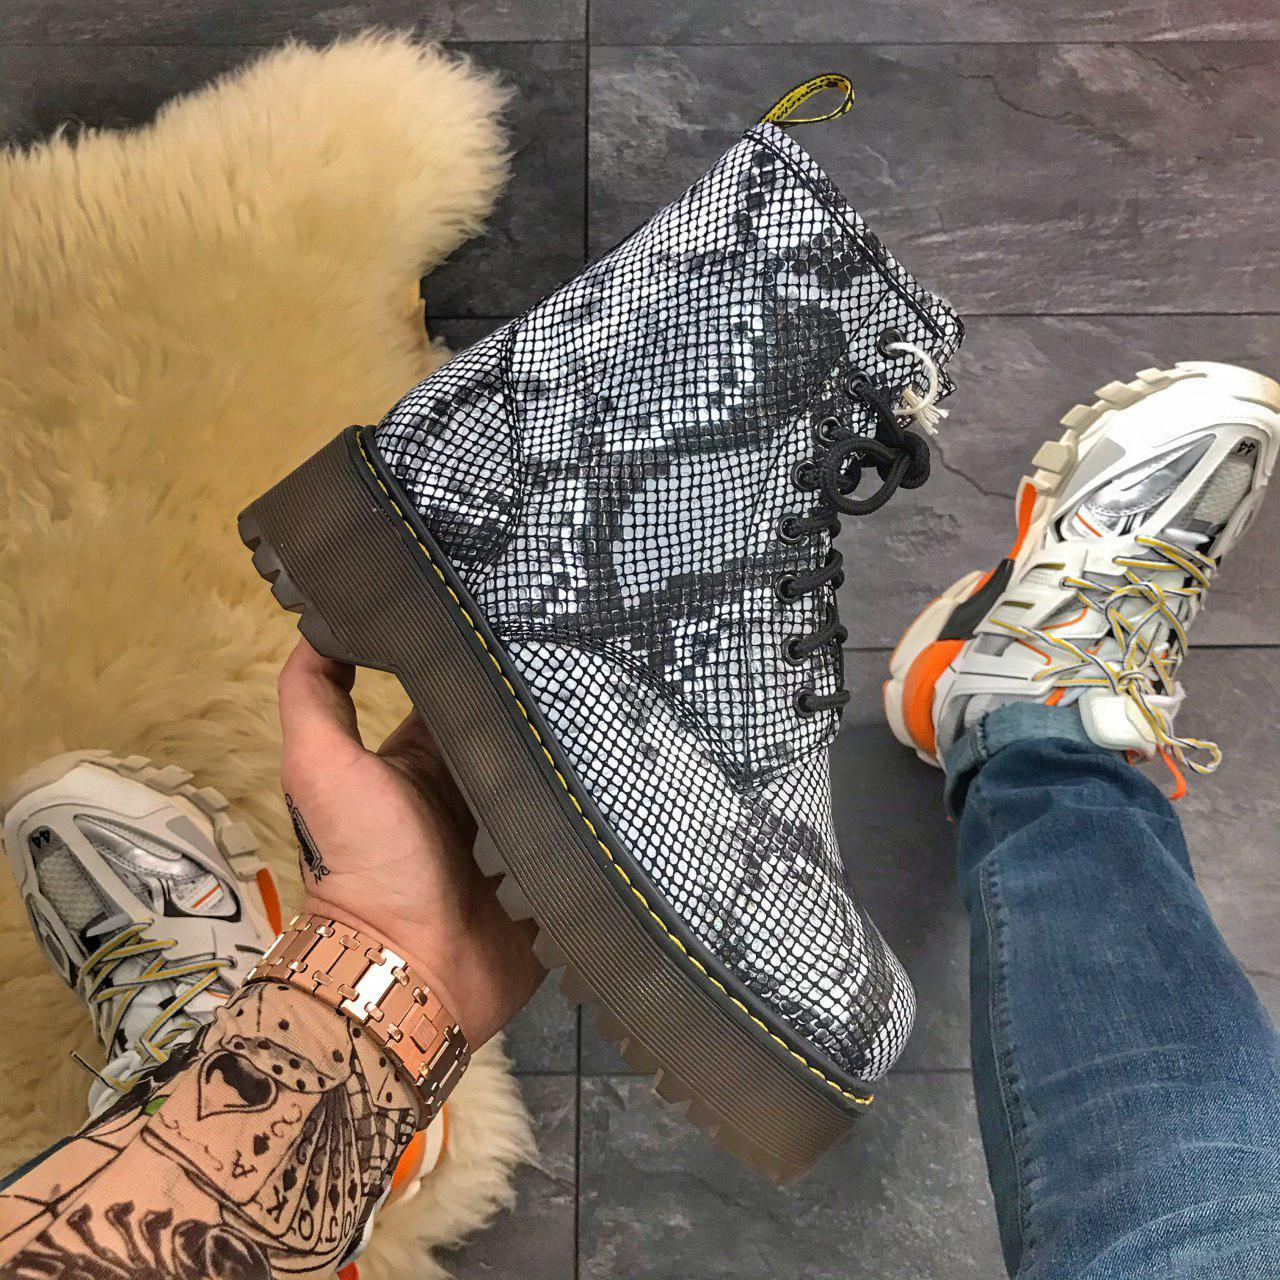 Женские зимние ботинки Dr. Martens Jadon Snake (Мех), др мартенс, жіночі черевики Dr Martens, ботінки мартінс